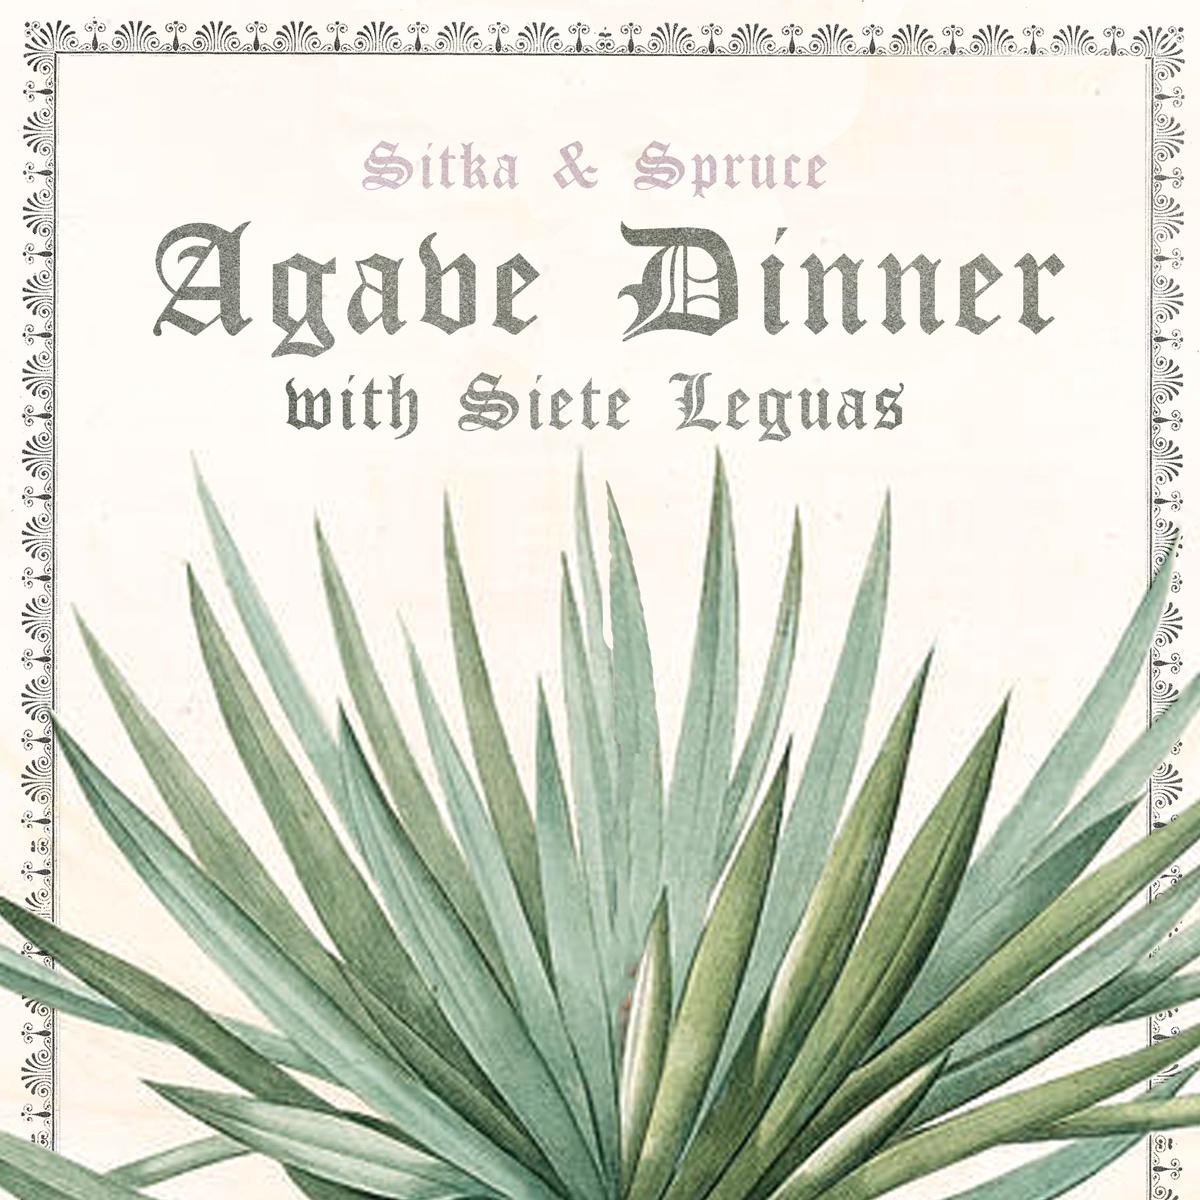 Sitka Spruce Agave Dinner With Siete Leguas Melrose Market